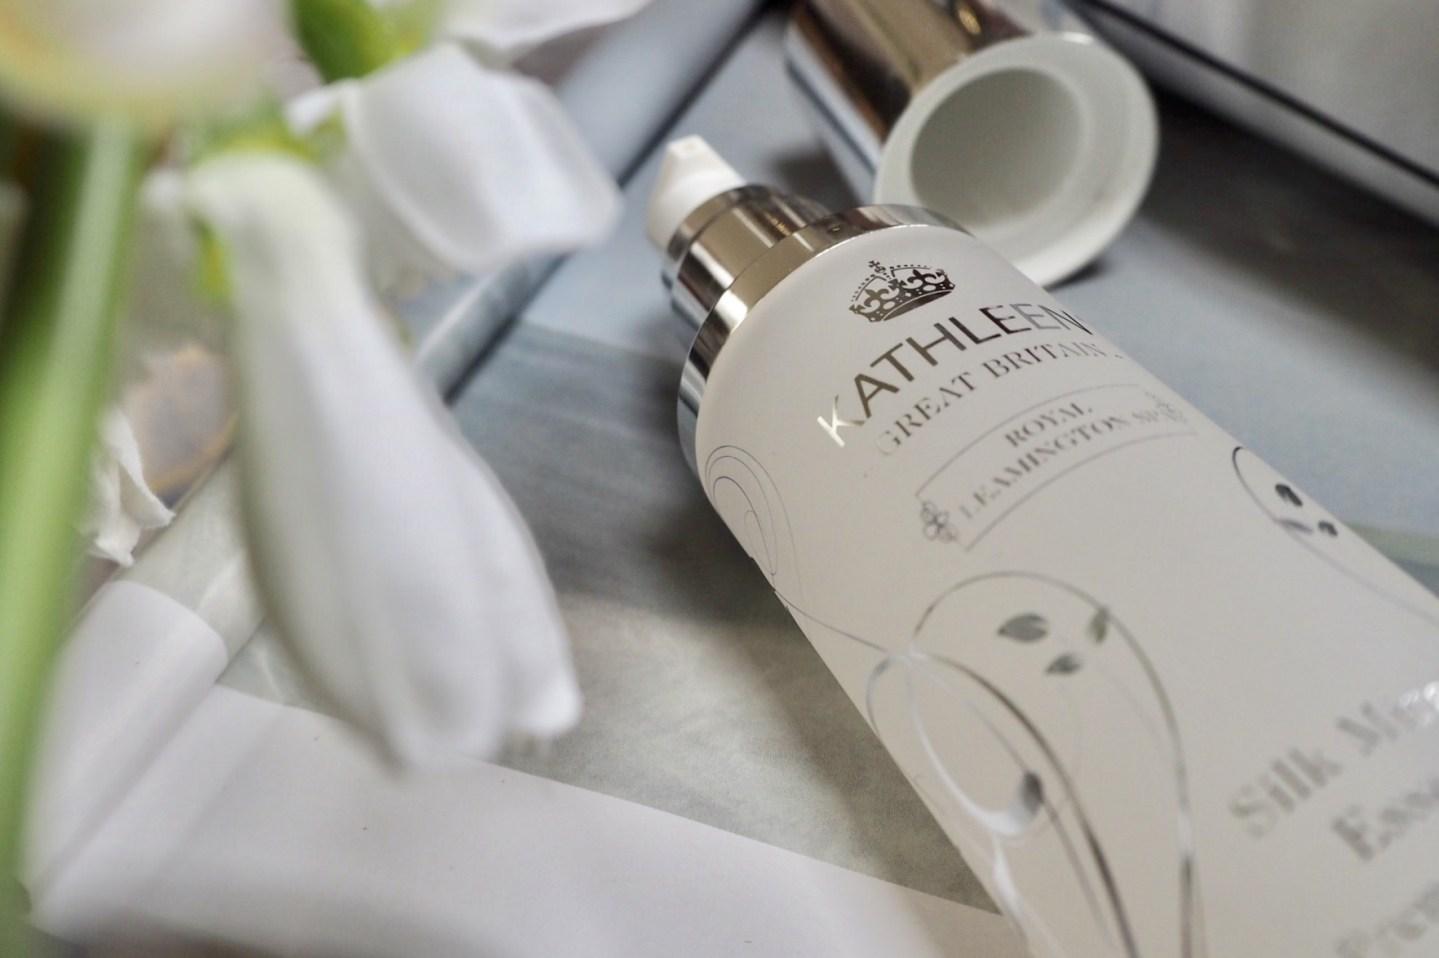 Kathleen Natural Skincare Silk Miracle Essence